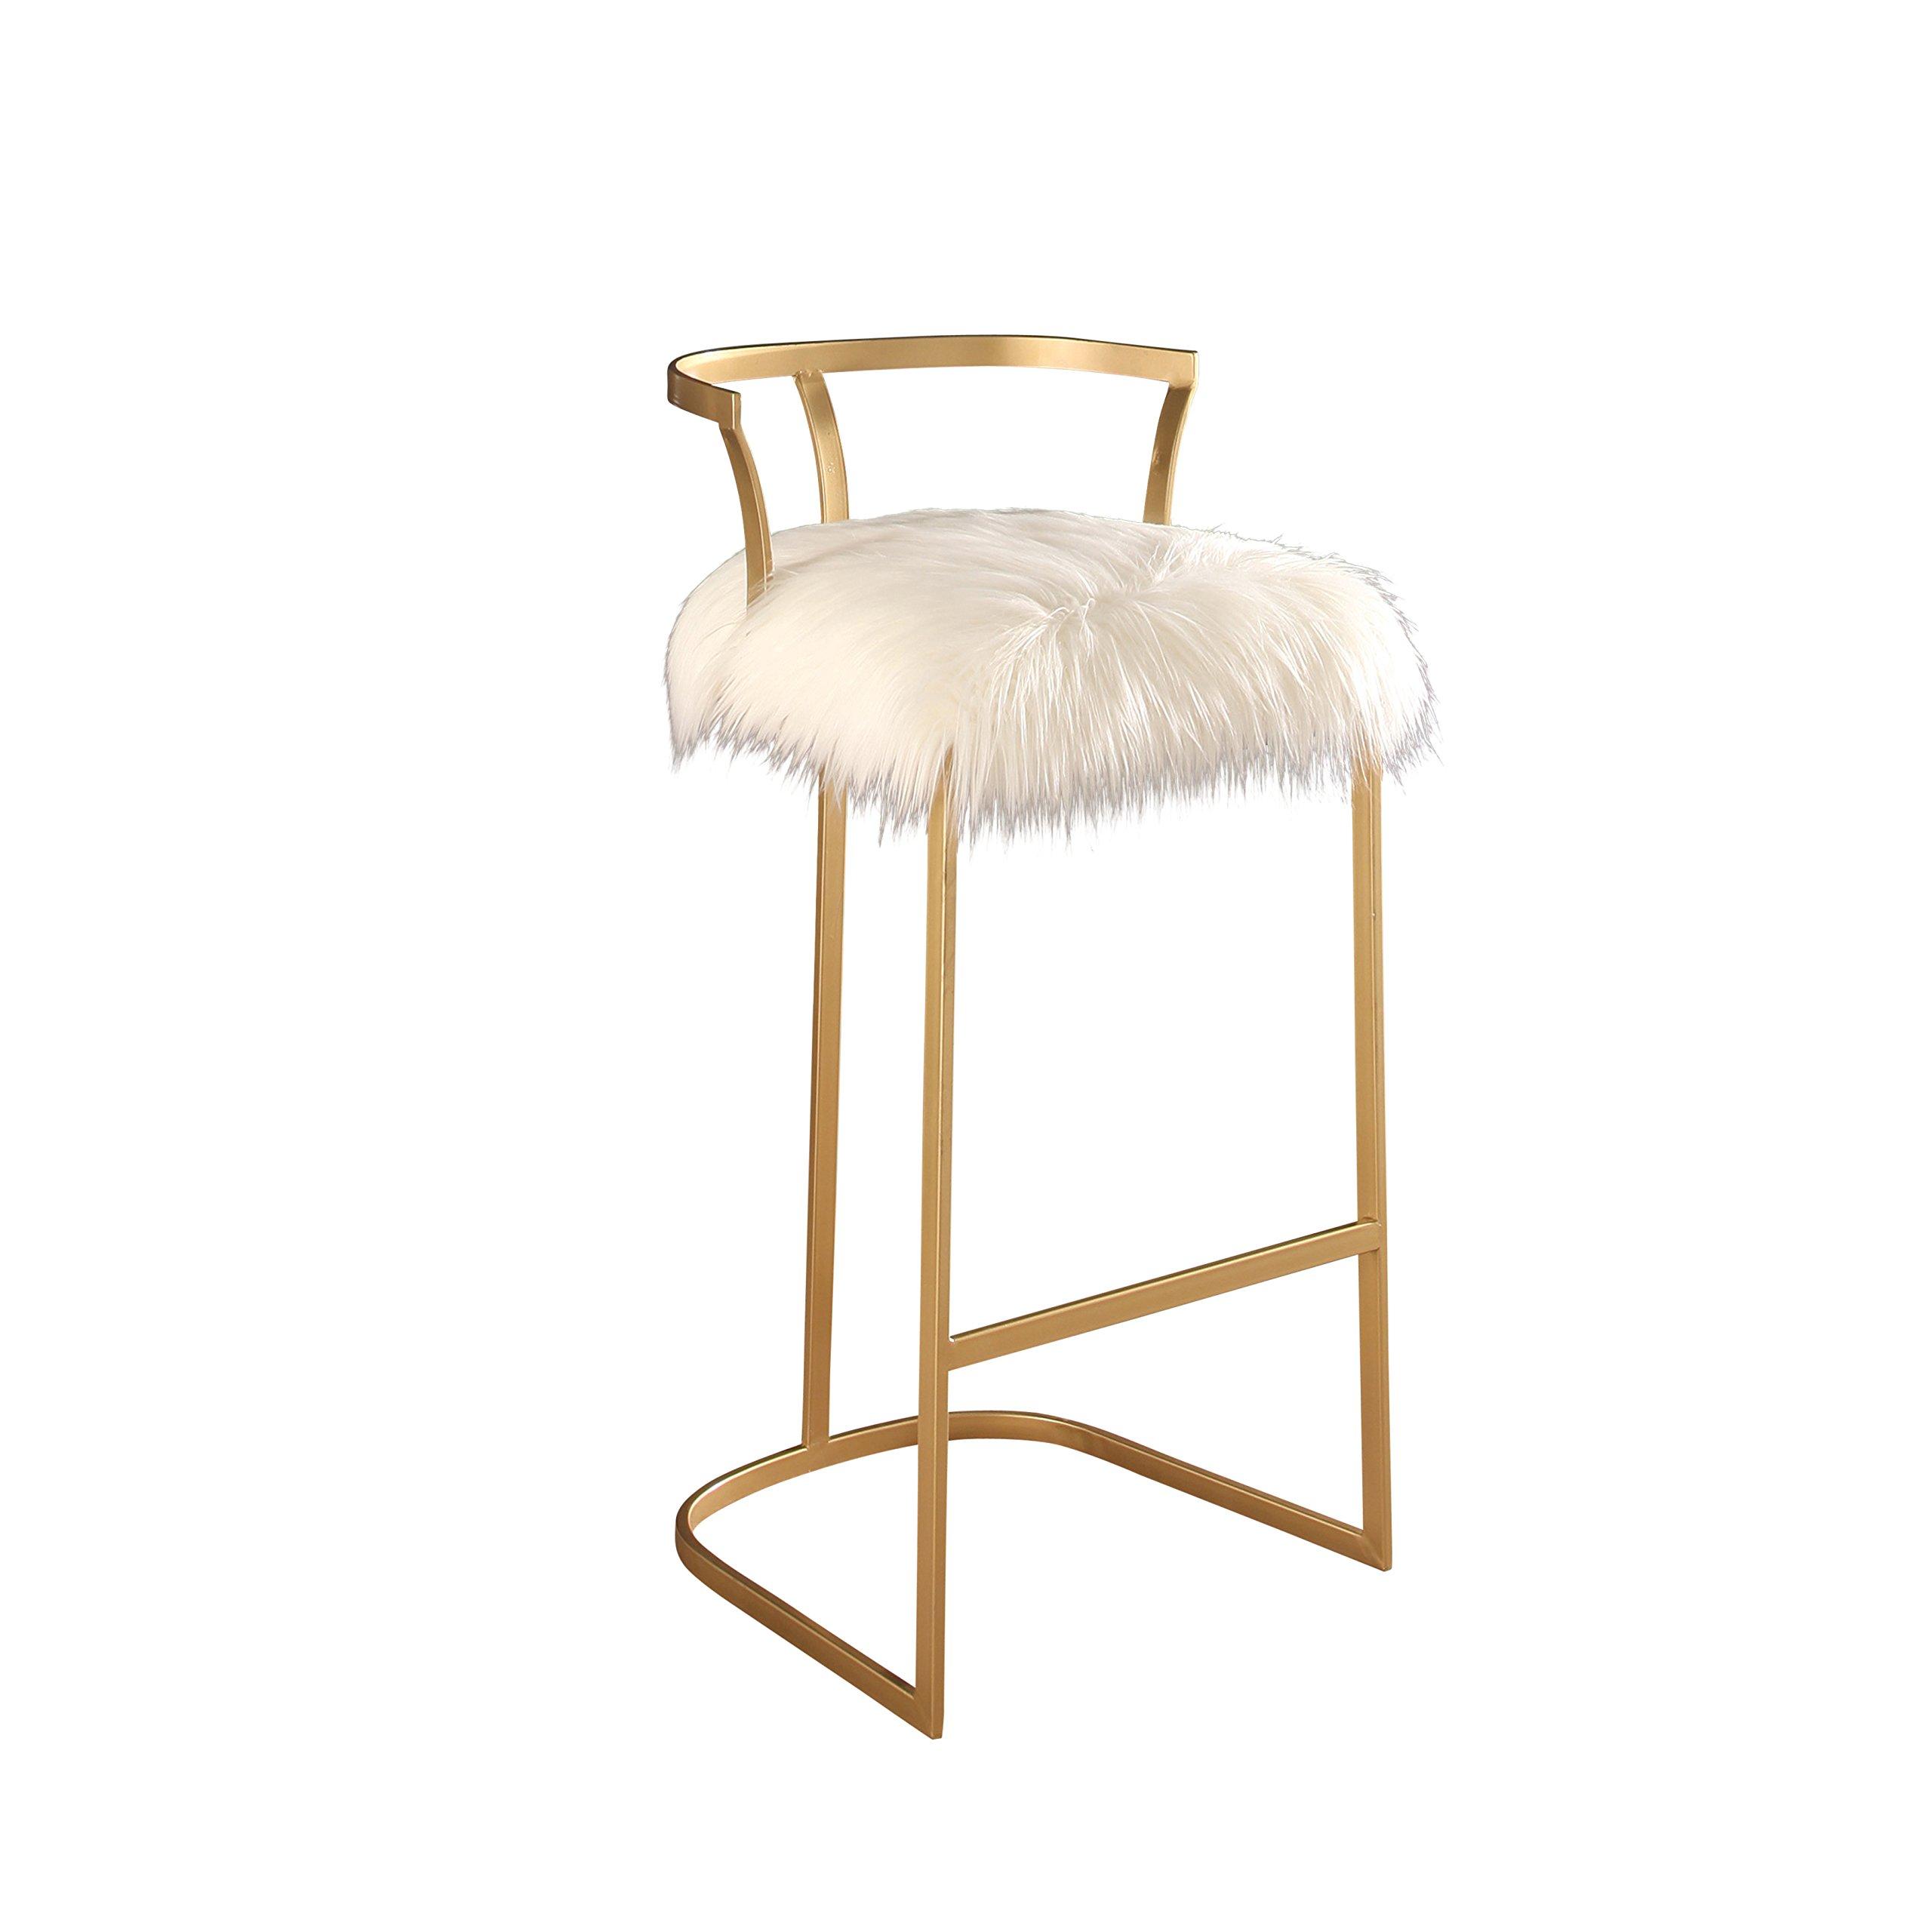 Abbyson Faithe Faux Fur Bar Stool, White/Gold